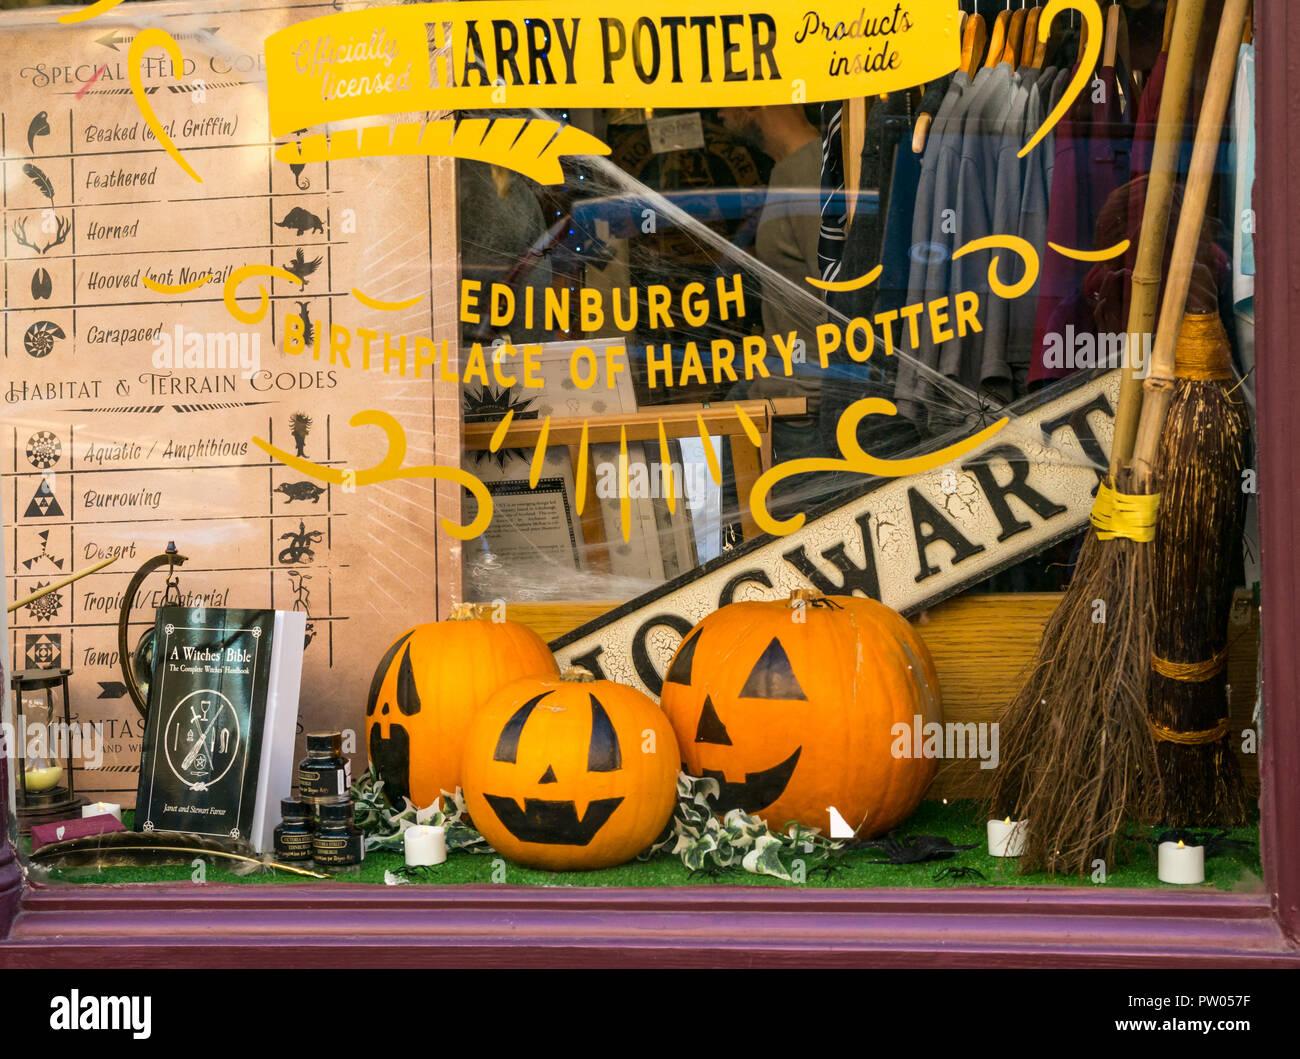 Harry Potter Diagon House shop window with memorabilia and pumpkins for Halloween, Cockburn Street, Edinburgh, Scotland, UK - Stock Image